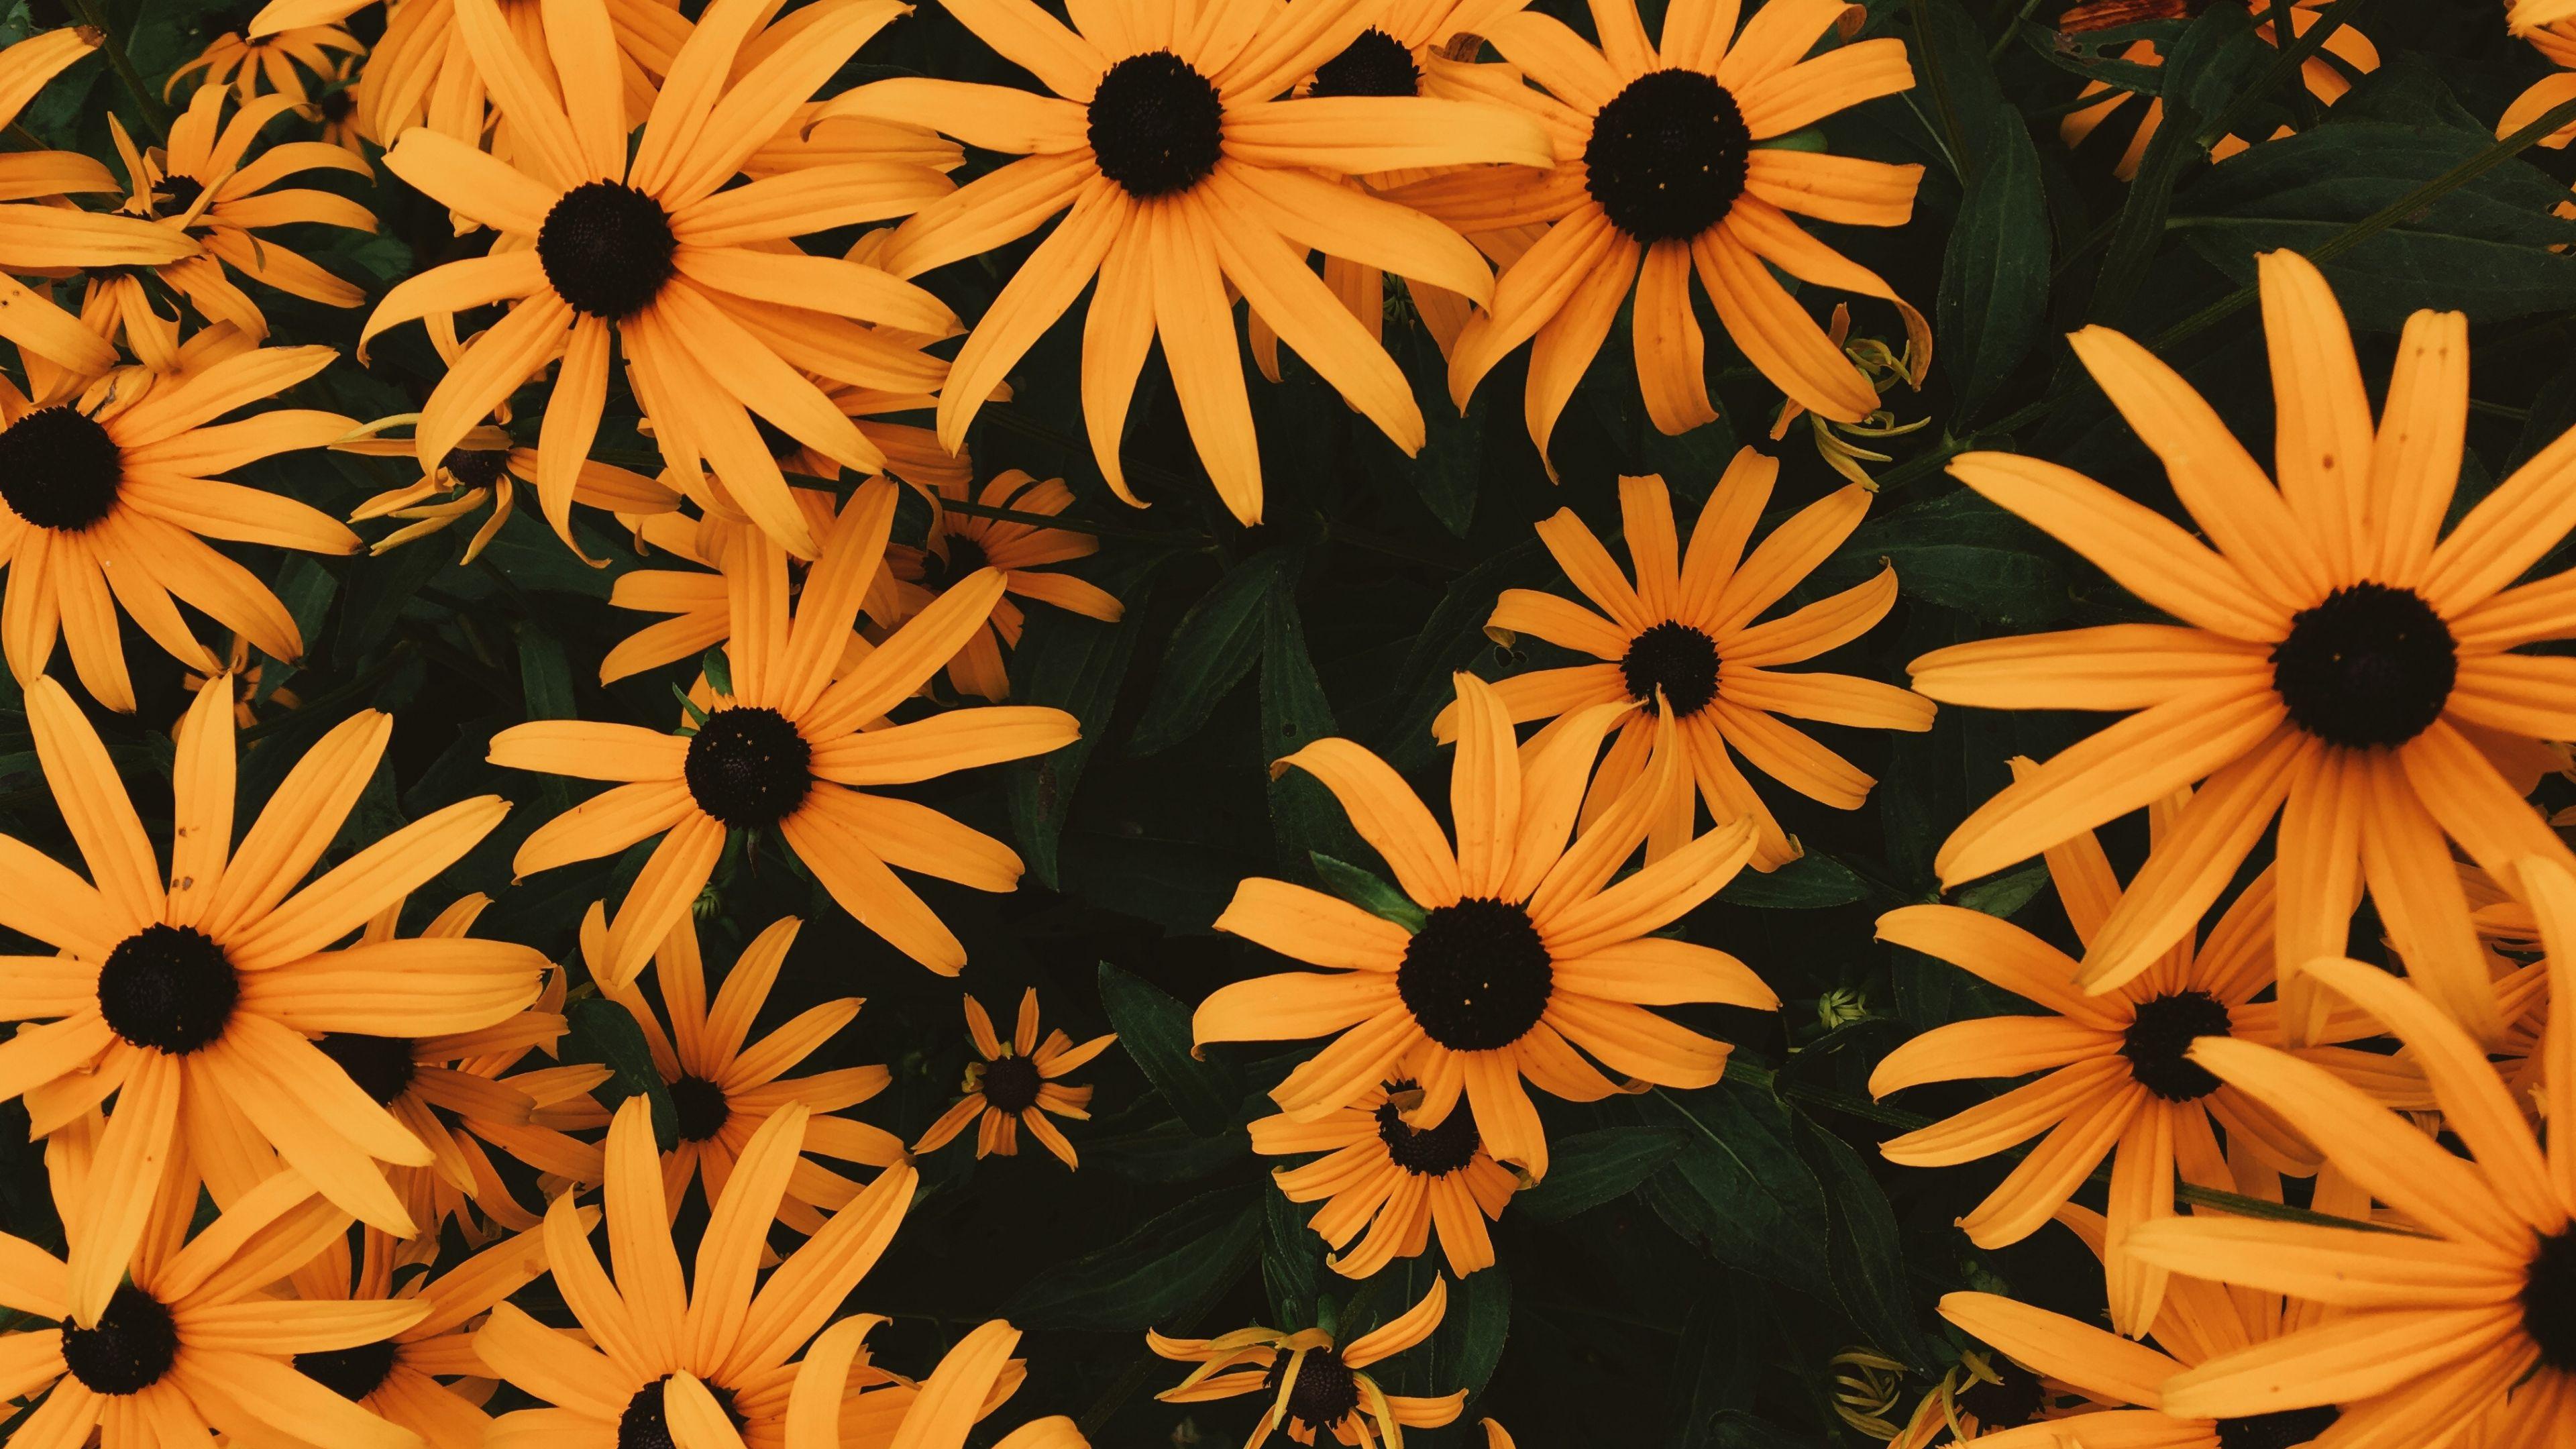 3840x2160 Wallpaper Coneflowers Flowers Flowerbed Many